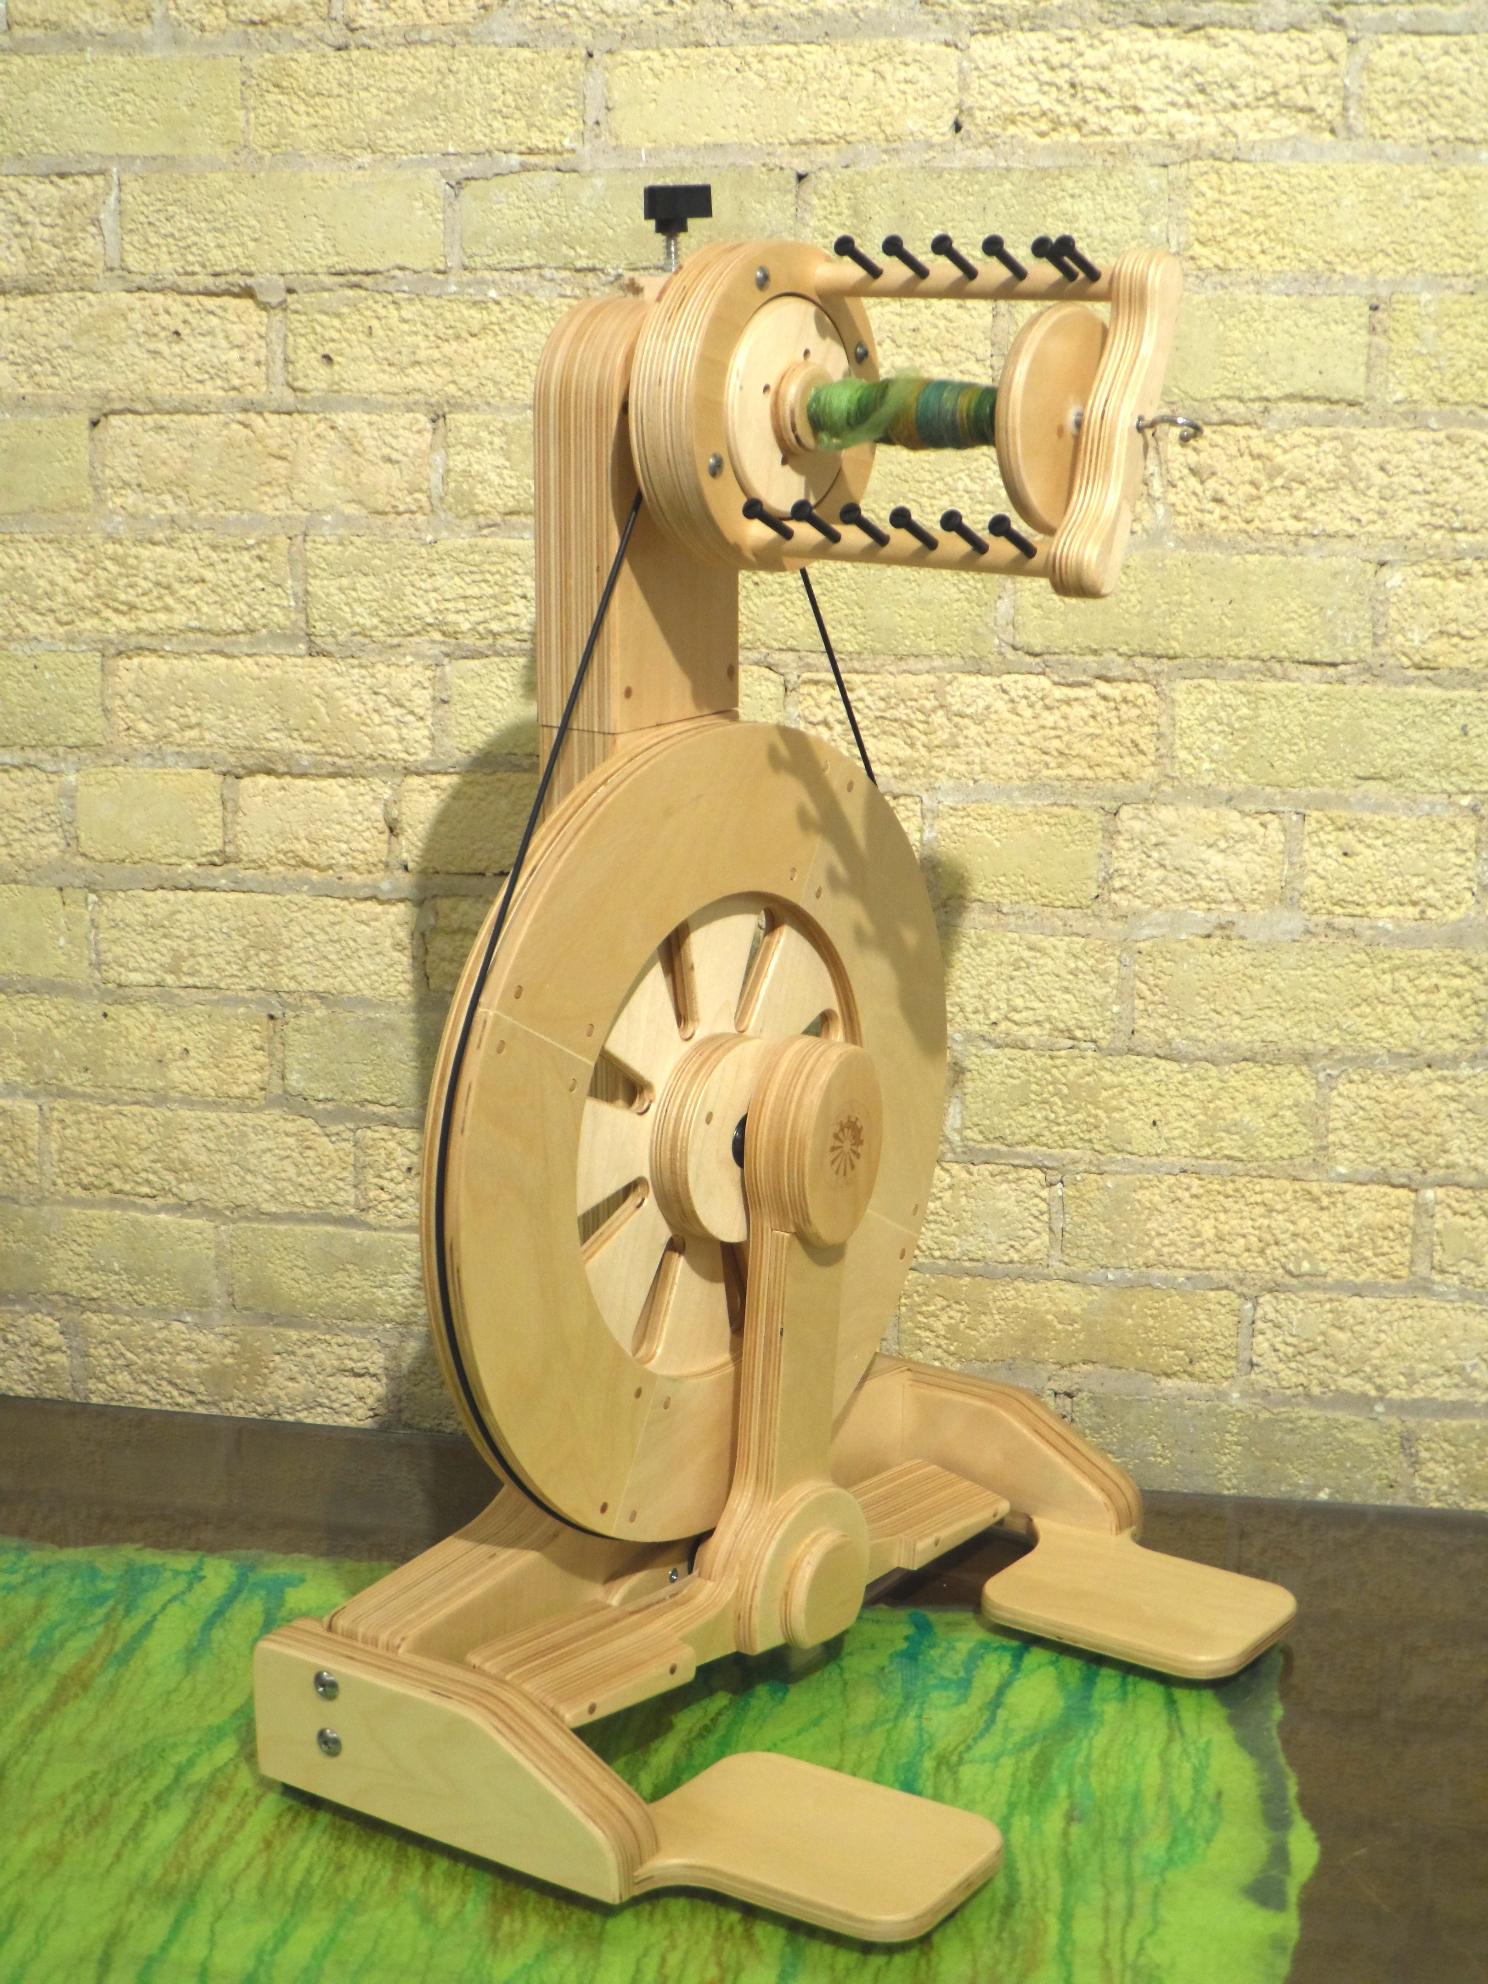 Echo Spinning wheel from Spinolution